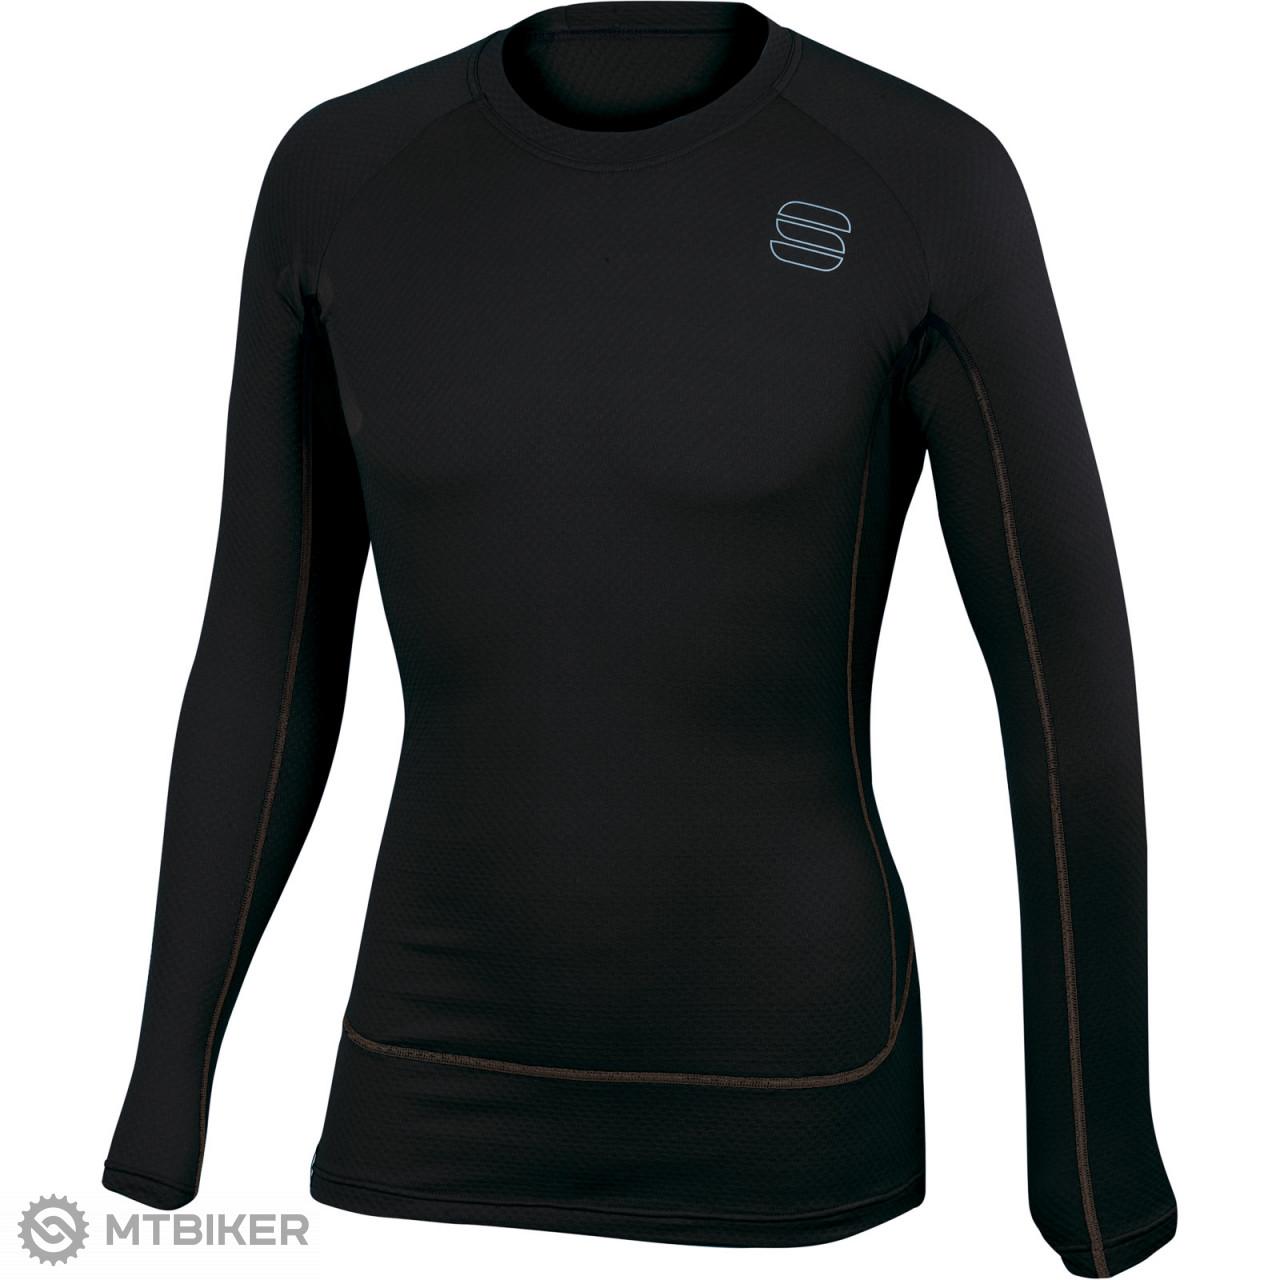 9cde1d0c275a Sportful TD Mid Termo tričko dlhý rukáv čierne - MTBIKER Shop